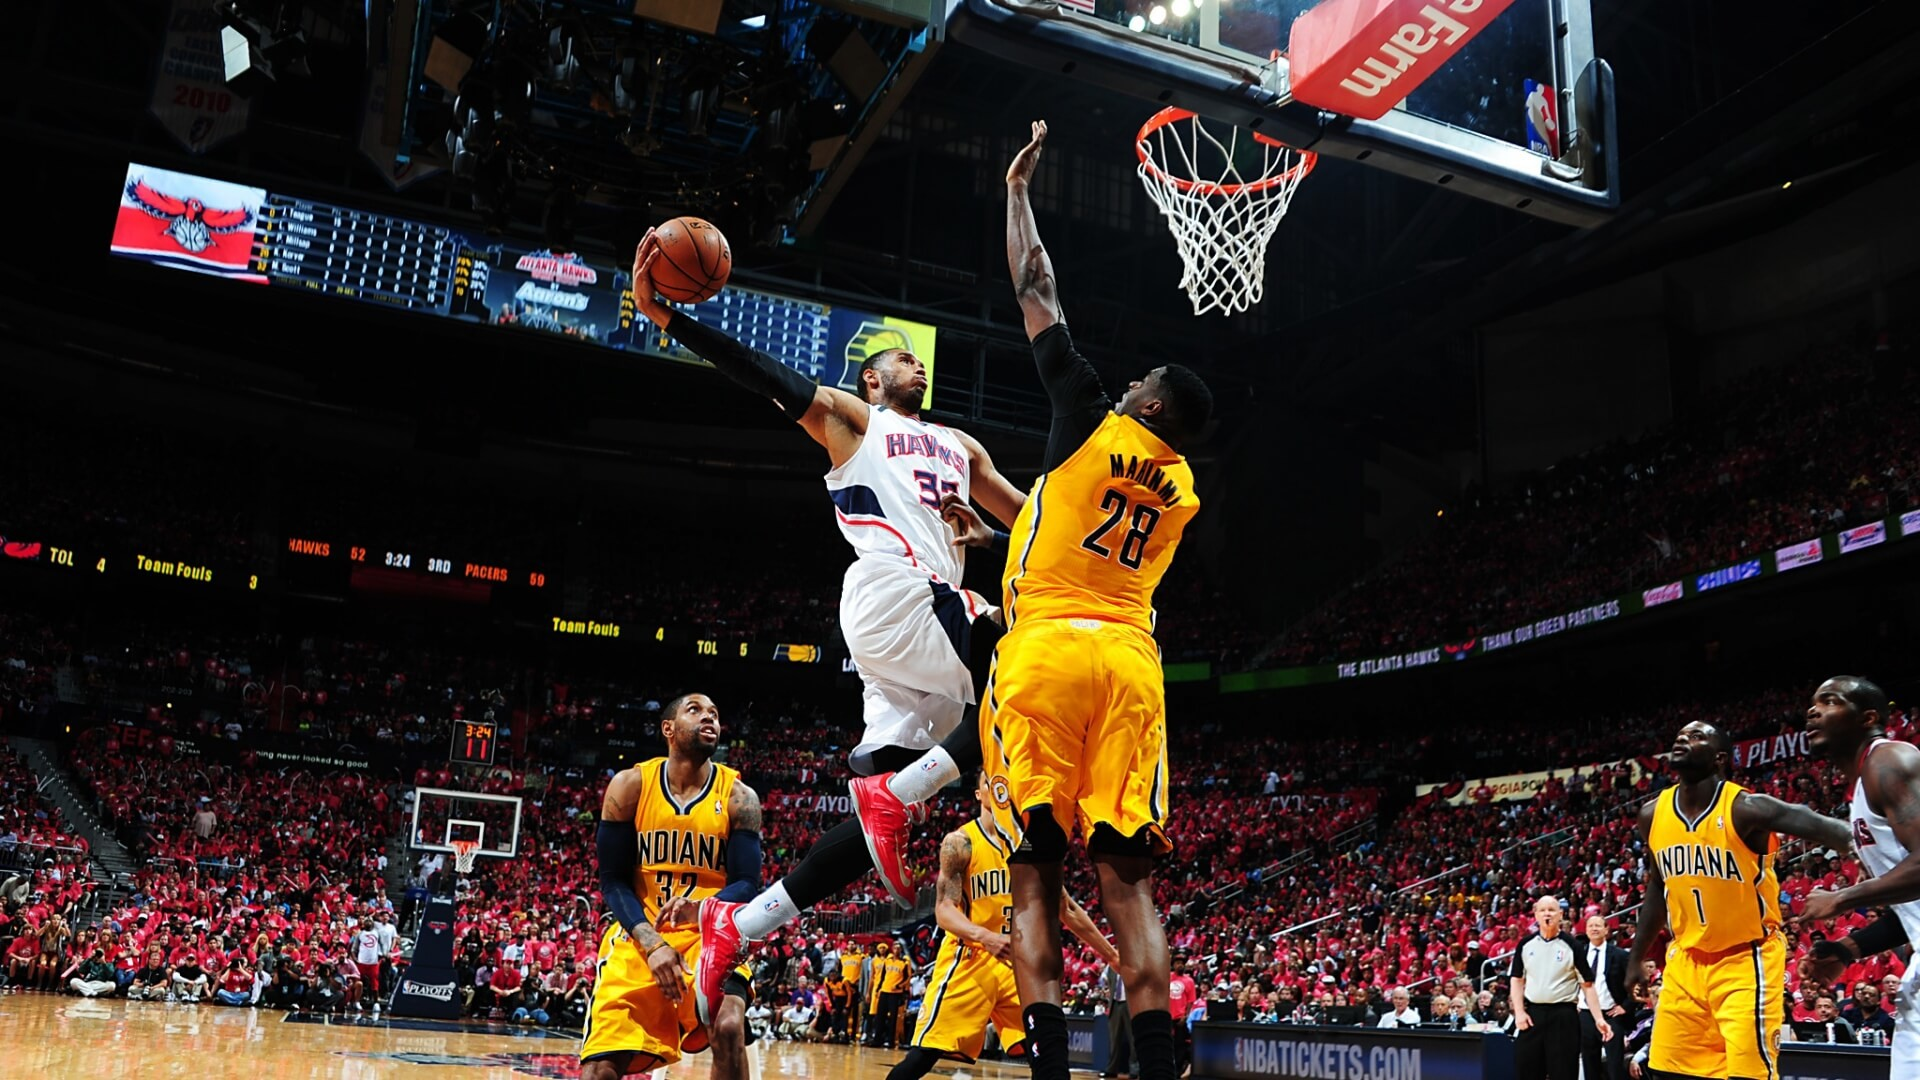 NBA Wallpapers for iPad